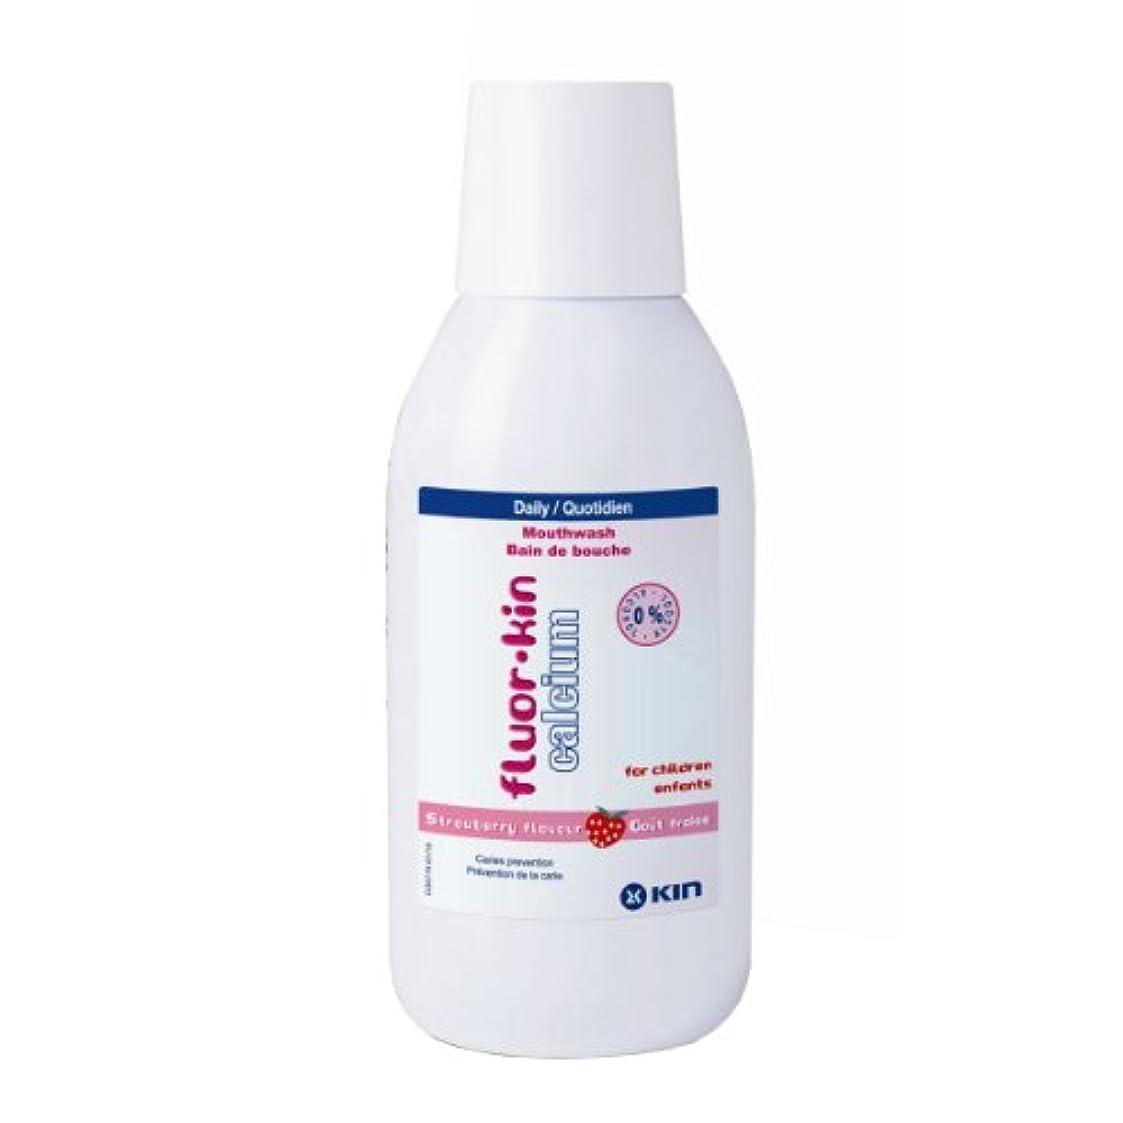 Kin Fluor Kin Calcium Mouthwash Strawberry 500ml [並行輸入品]